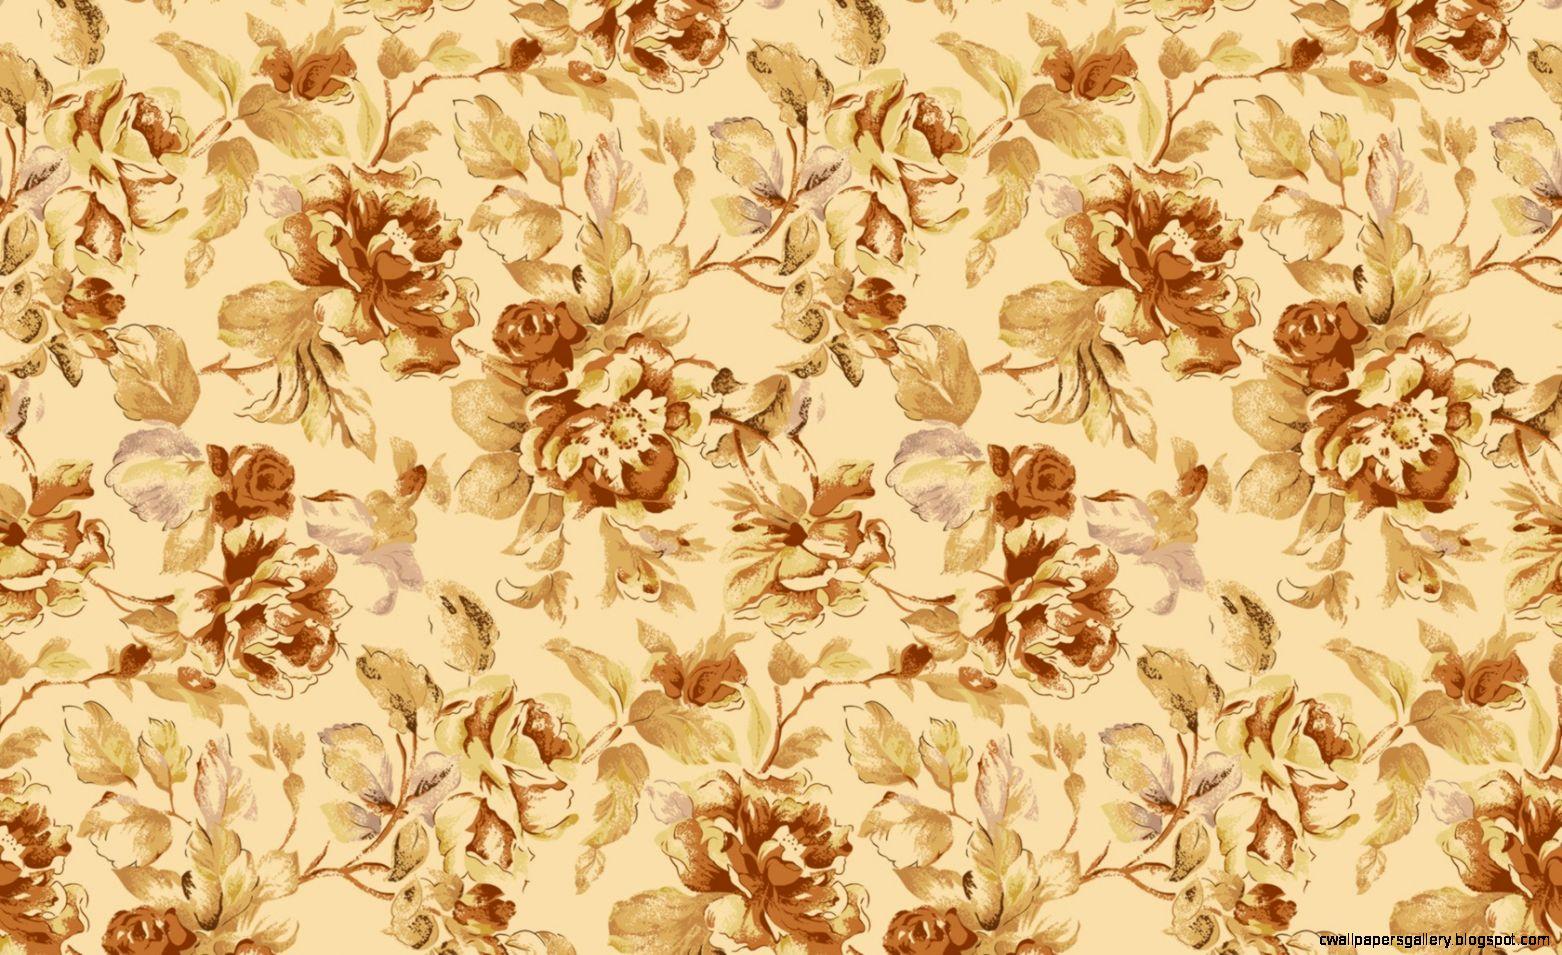 Fl Pattern Wallpaper by Mindy Wildgrube on FL  Flowers HDQ